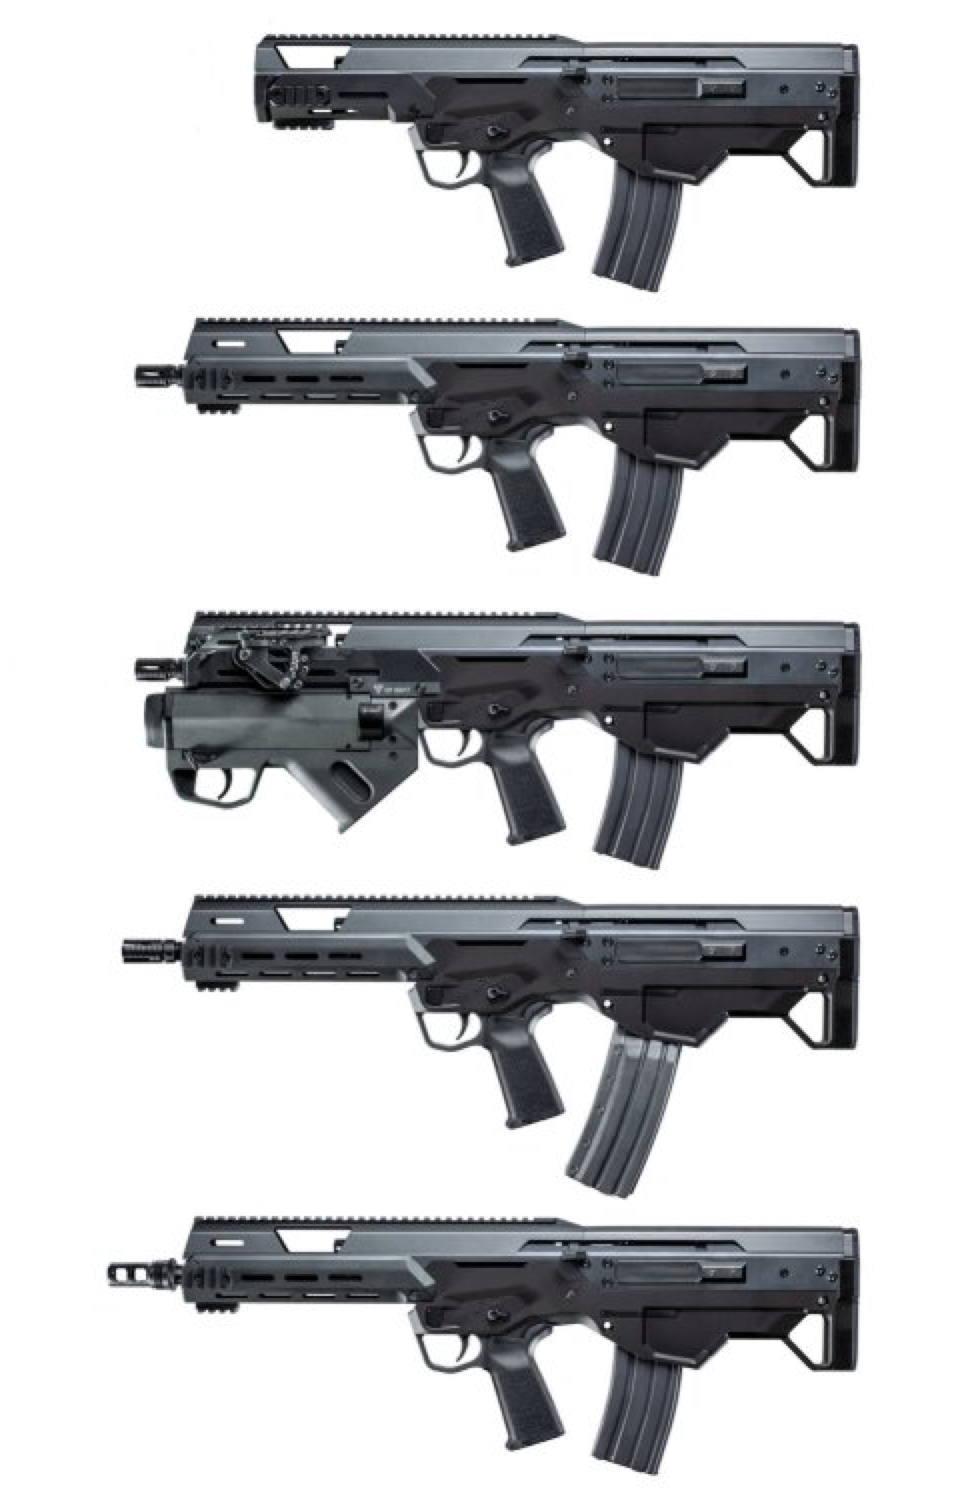 Assault Rifle clipart g27p Fabryka_broni_modular_bullpup Page Carbines WeaponsMan Rifles